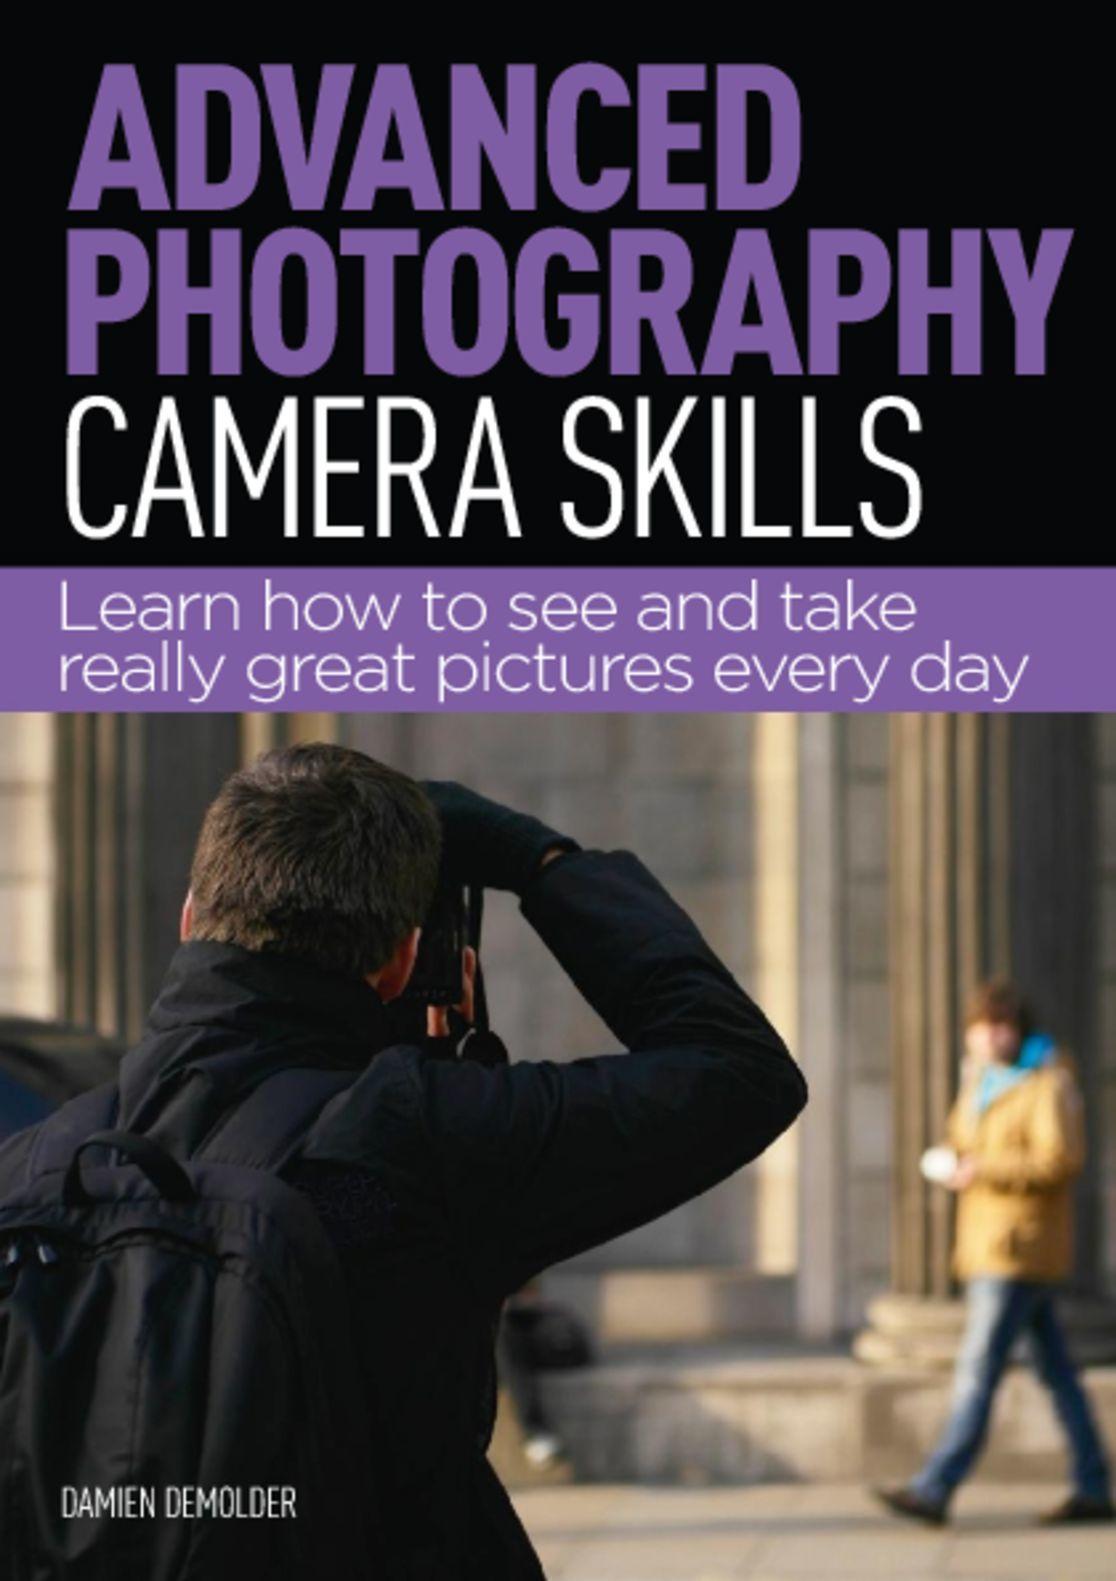 Advanced Photography Camera Skills (Digital)